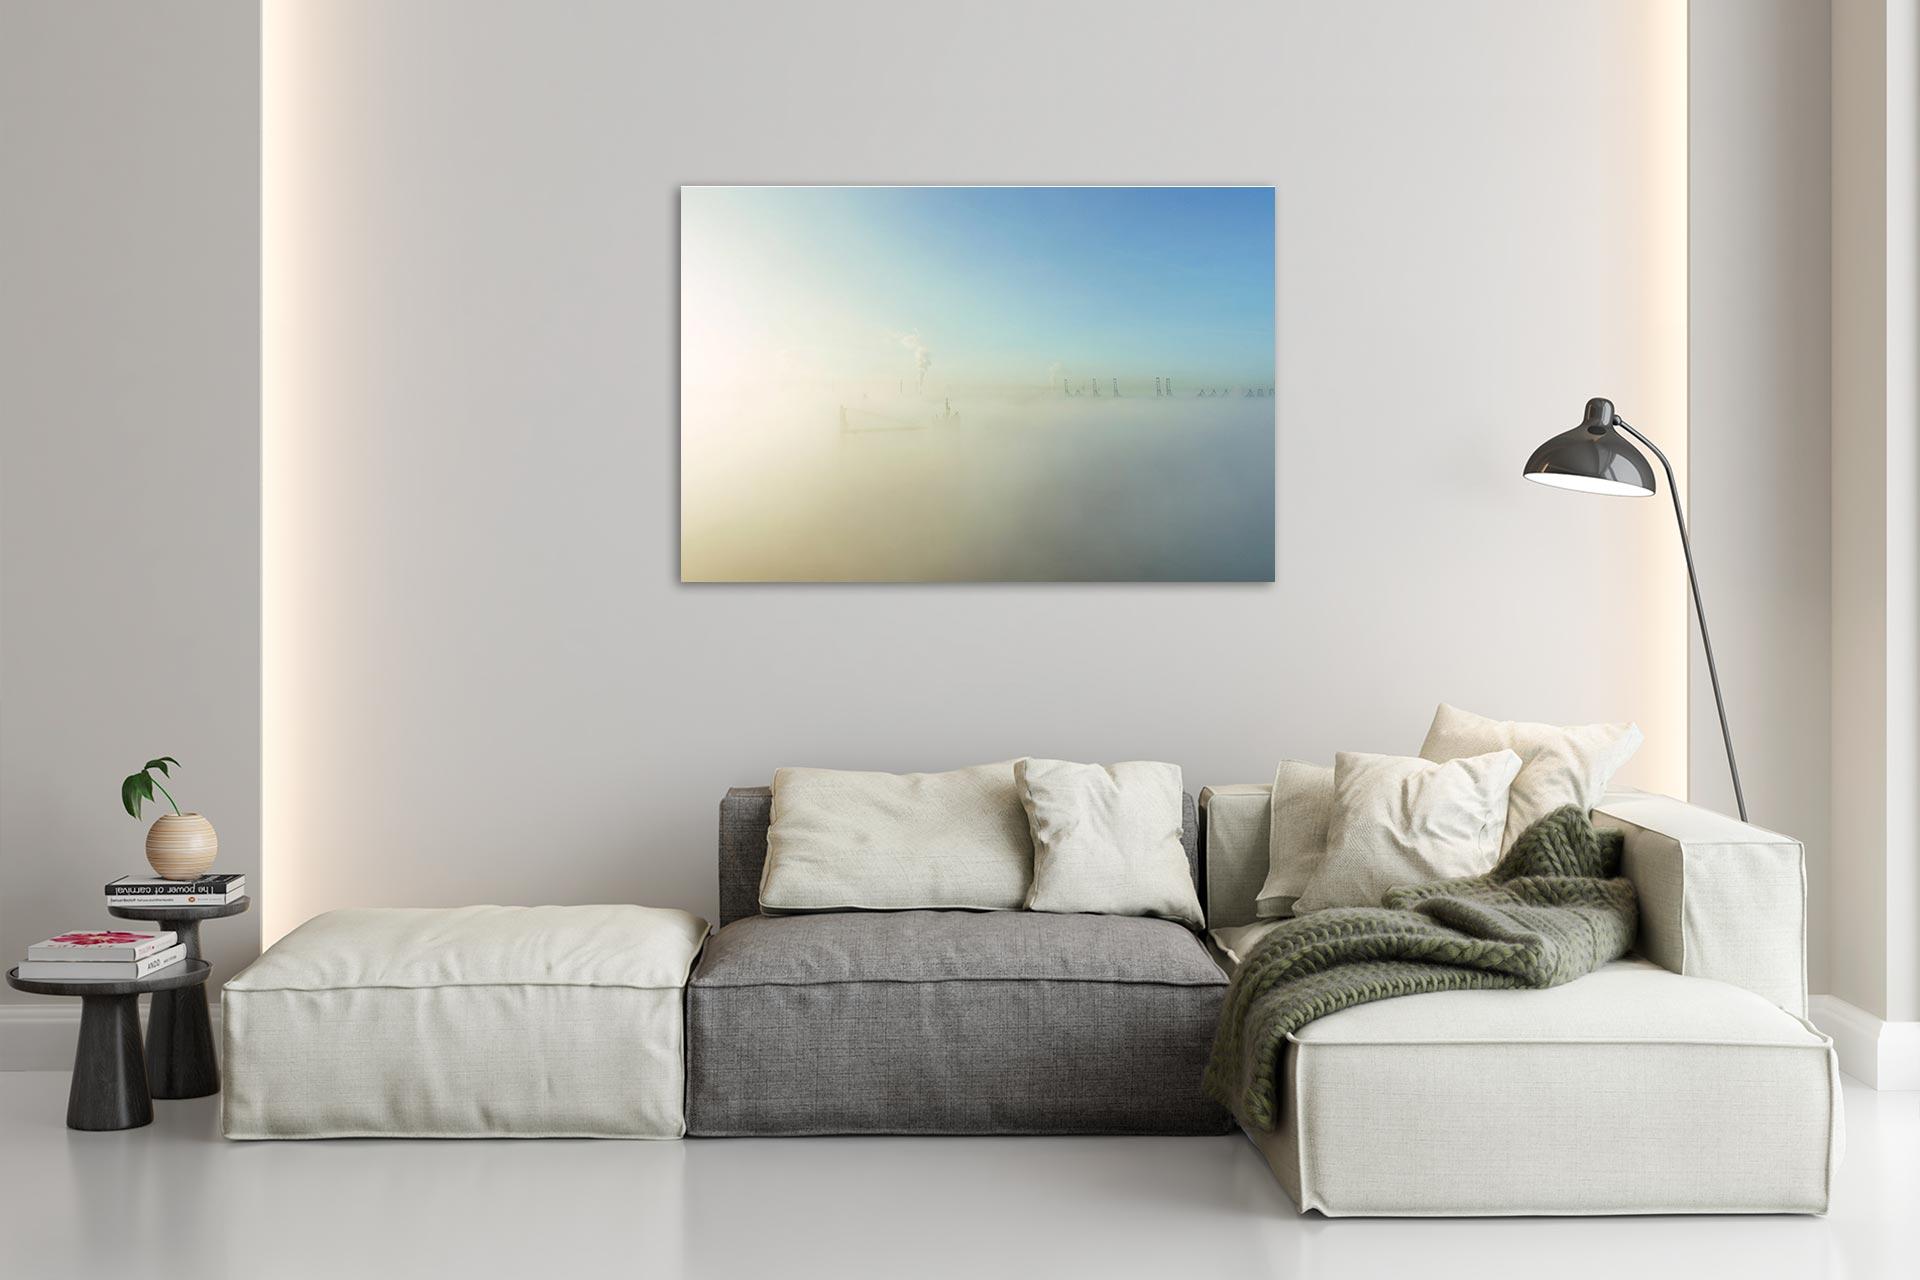 LCW260-nebelgiraffen-hamburg-wandbild-bild-auf-leinwand-acrylglas-aludibond-wohnzimmer